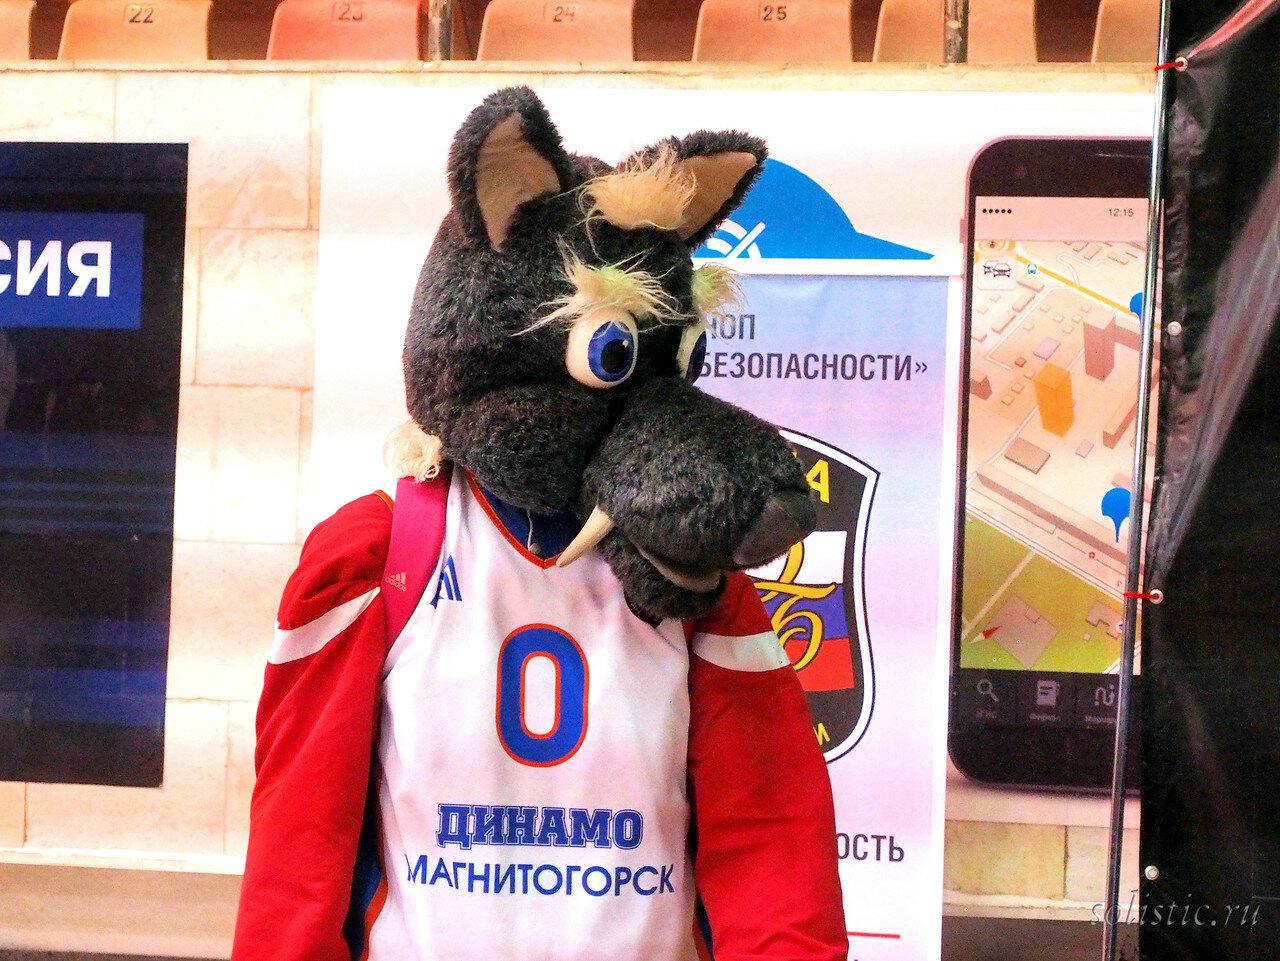 4 Динамо Магнитогорск - Нефтехимик 25.01.2018